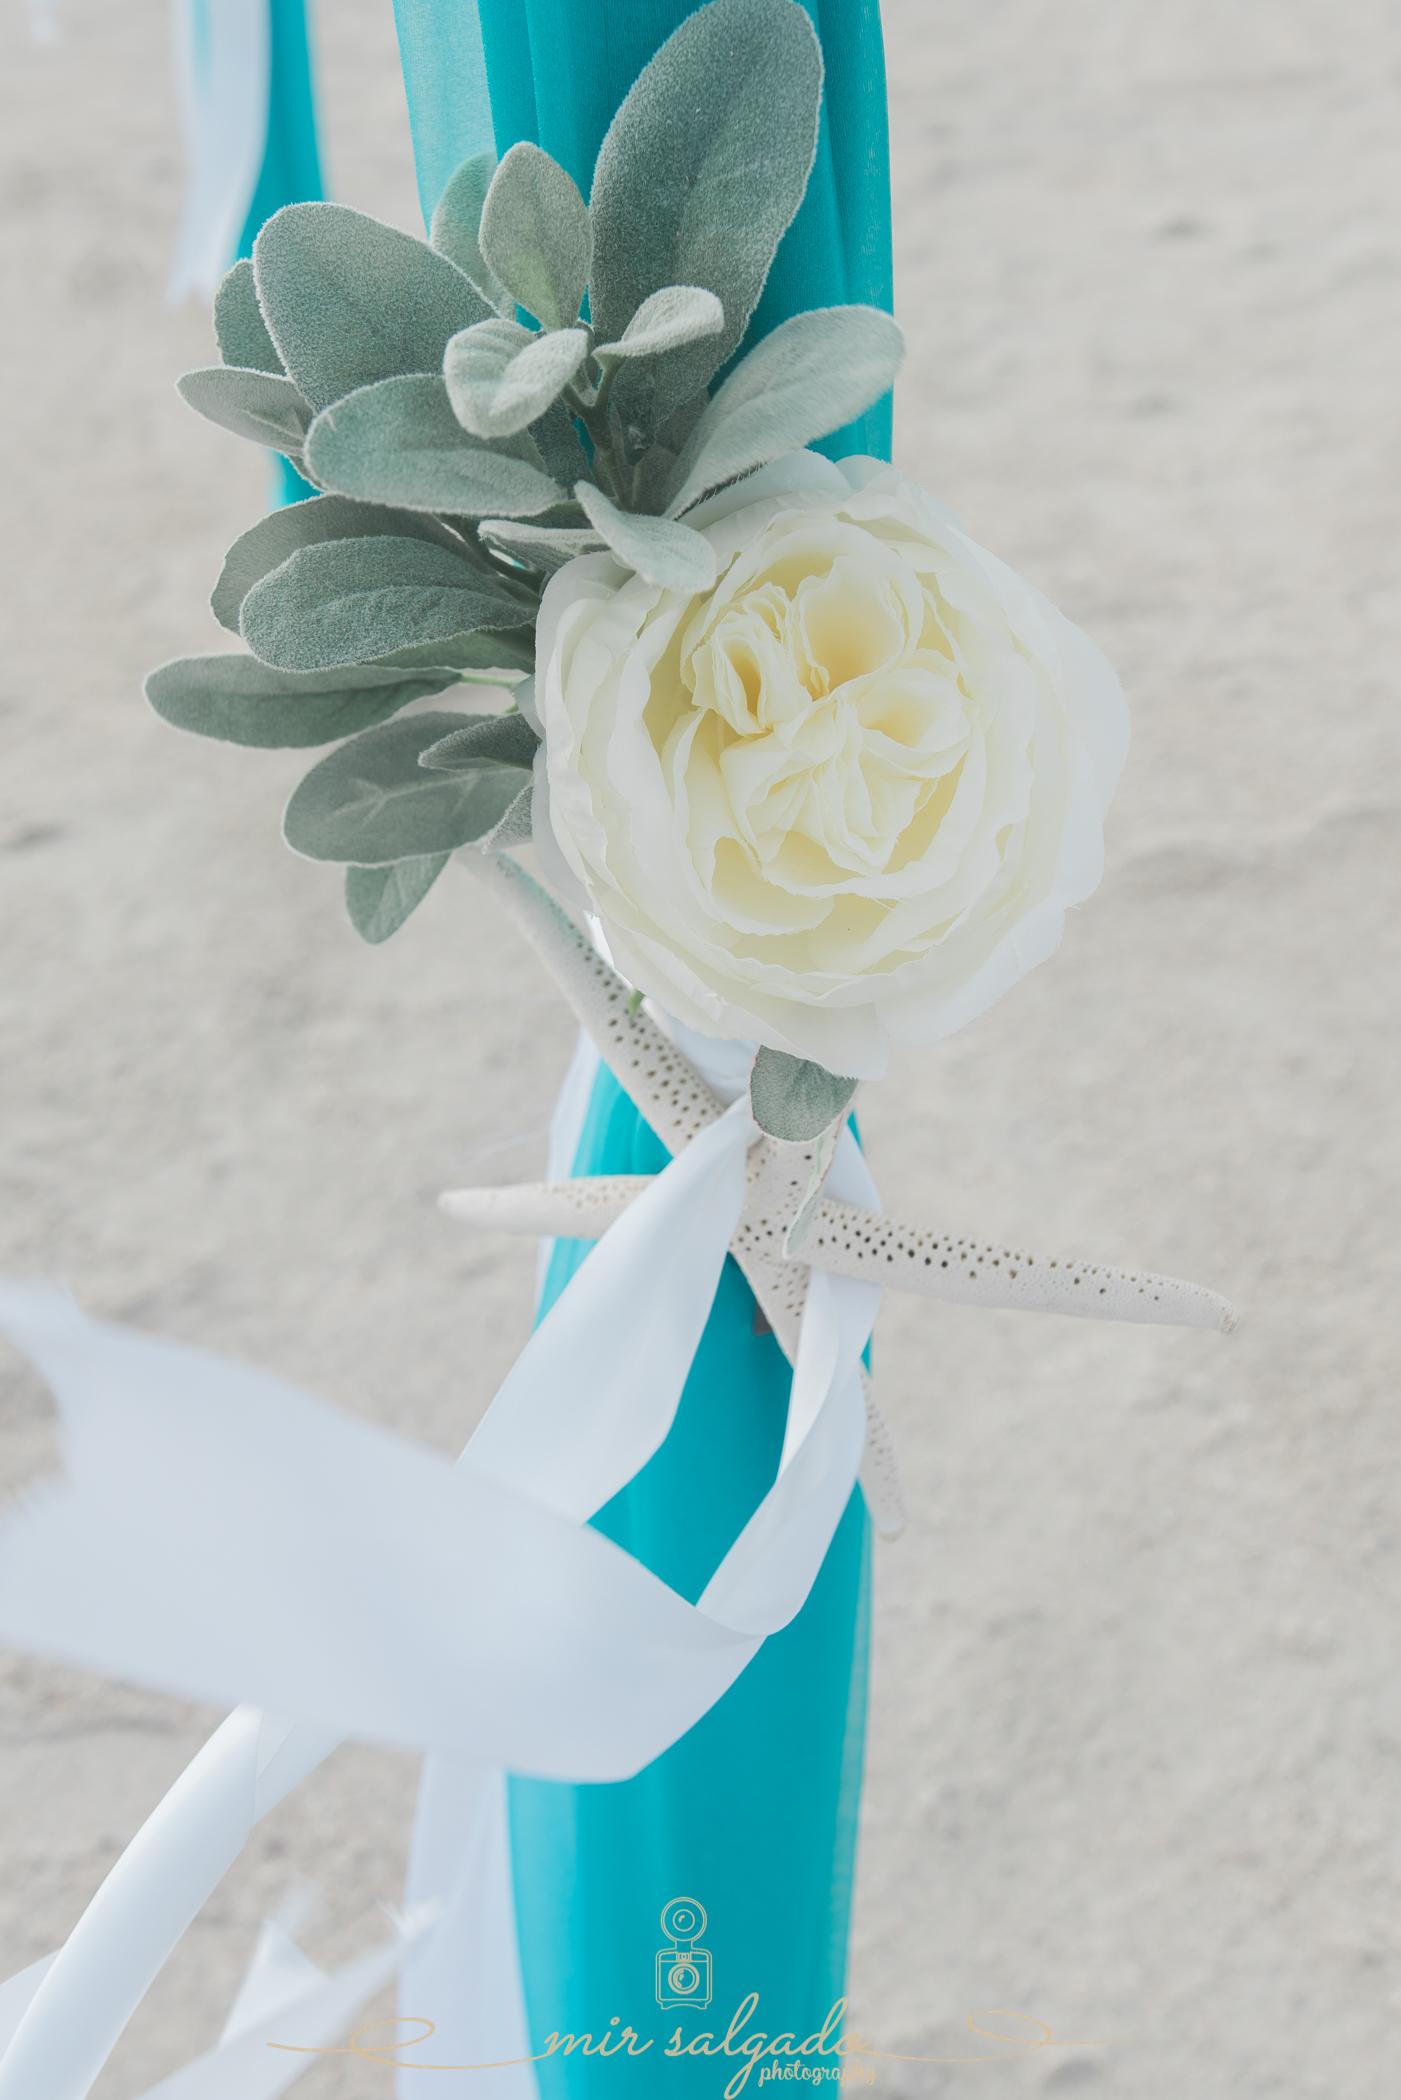 ST.Pete-wedding-set-up, tide-the-knot-beach-weddings